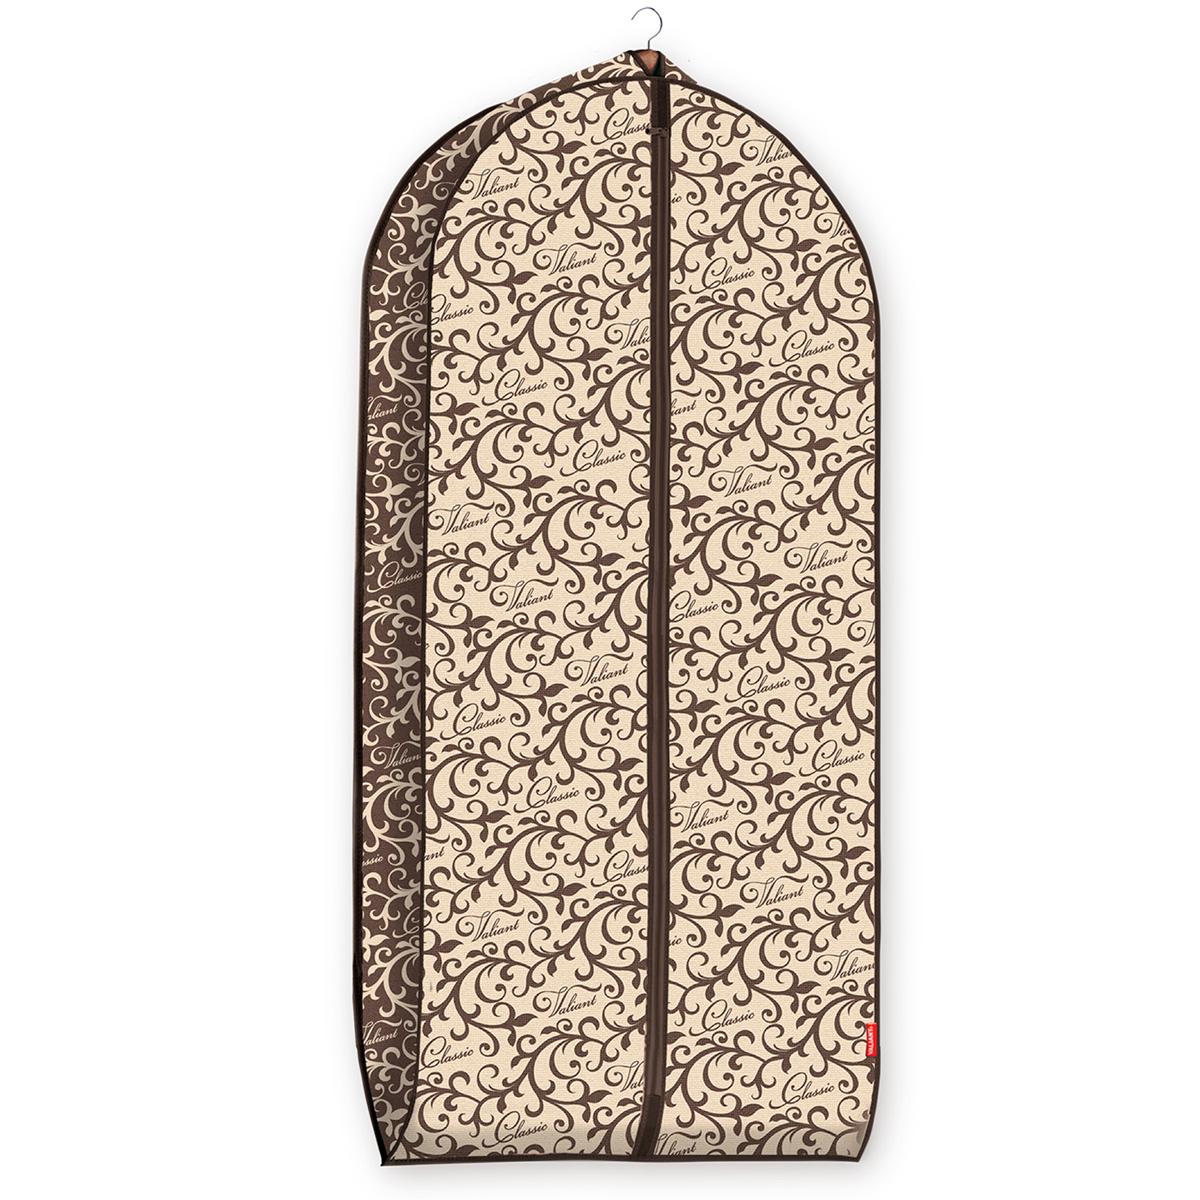 Чехол для одежды Valiant Classic, объемный, 60 см х 137 см х 10 см чехол для одежды valiant classic объемный 60 х 100 х 10 см